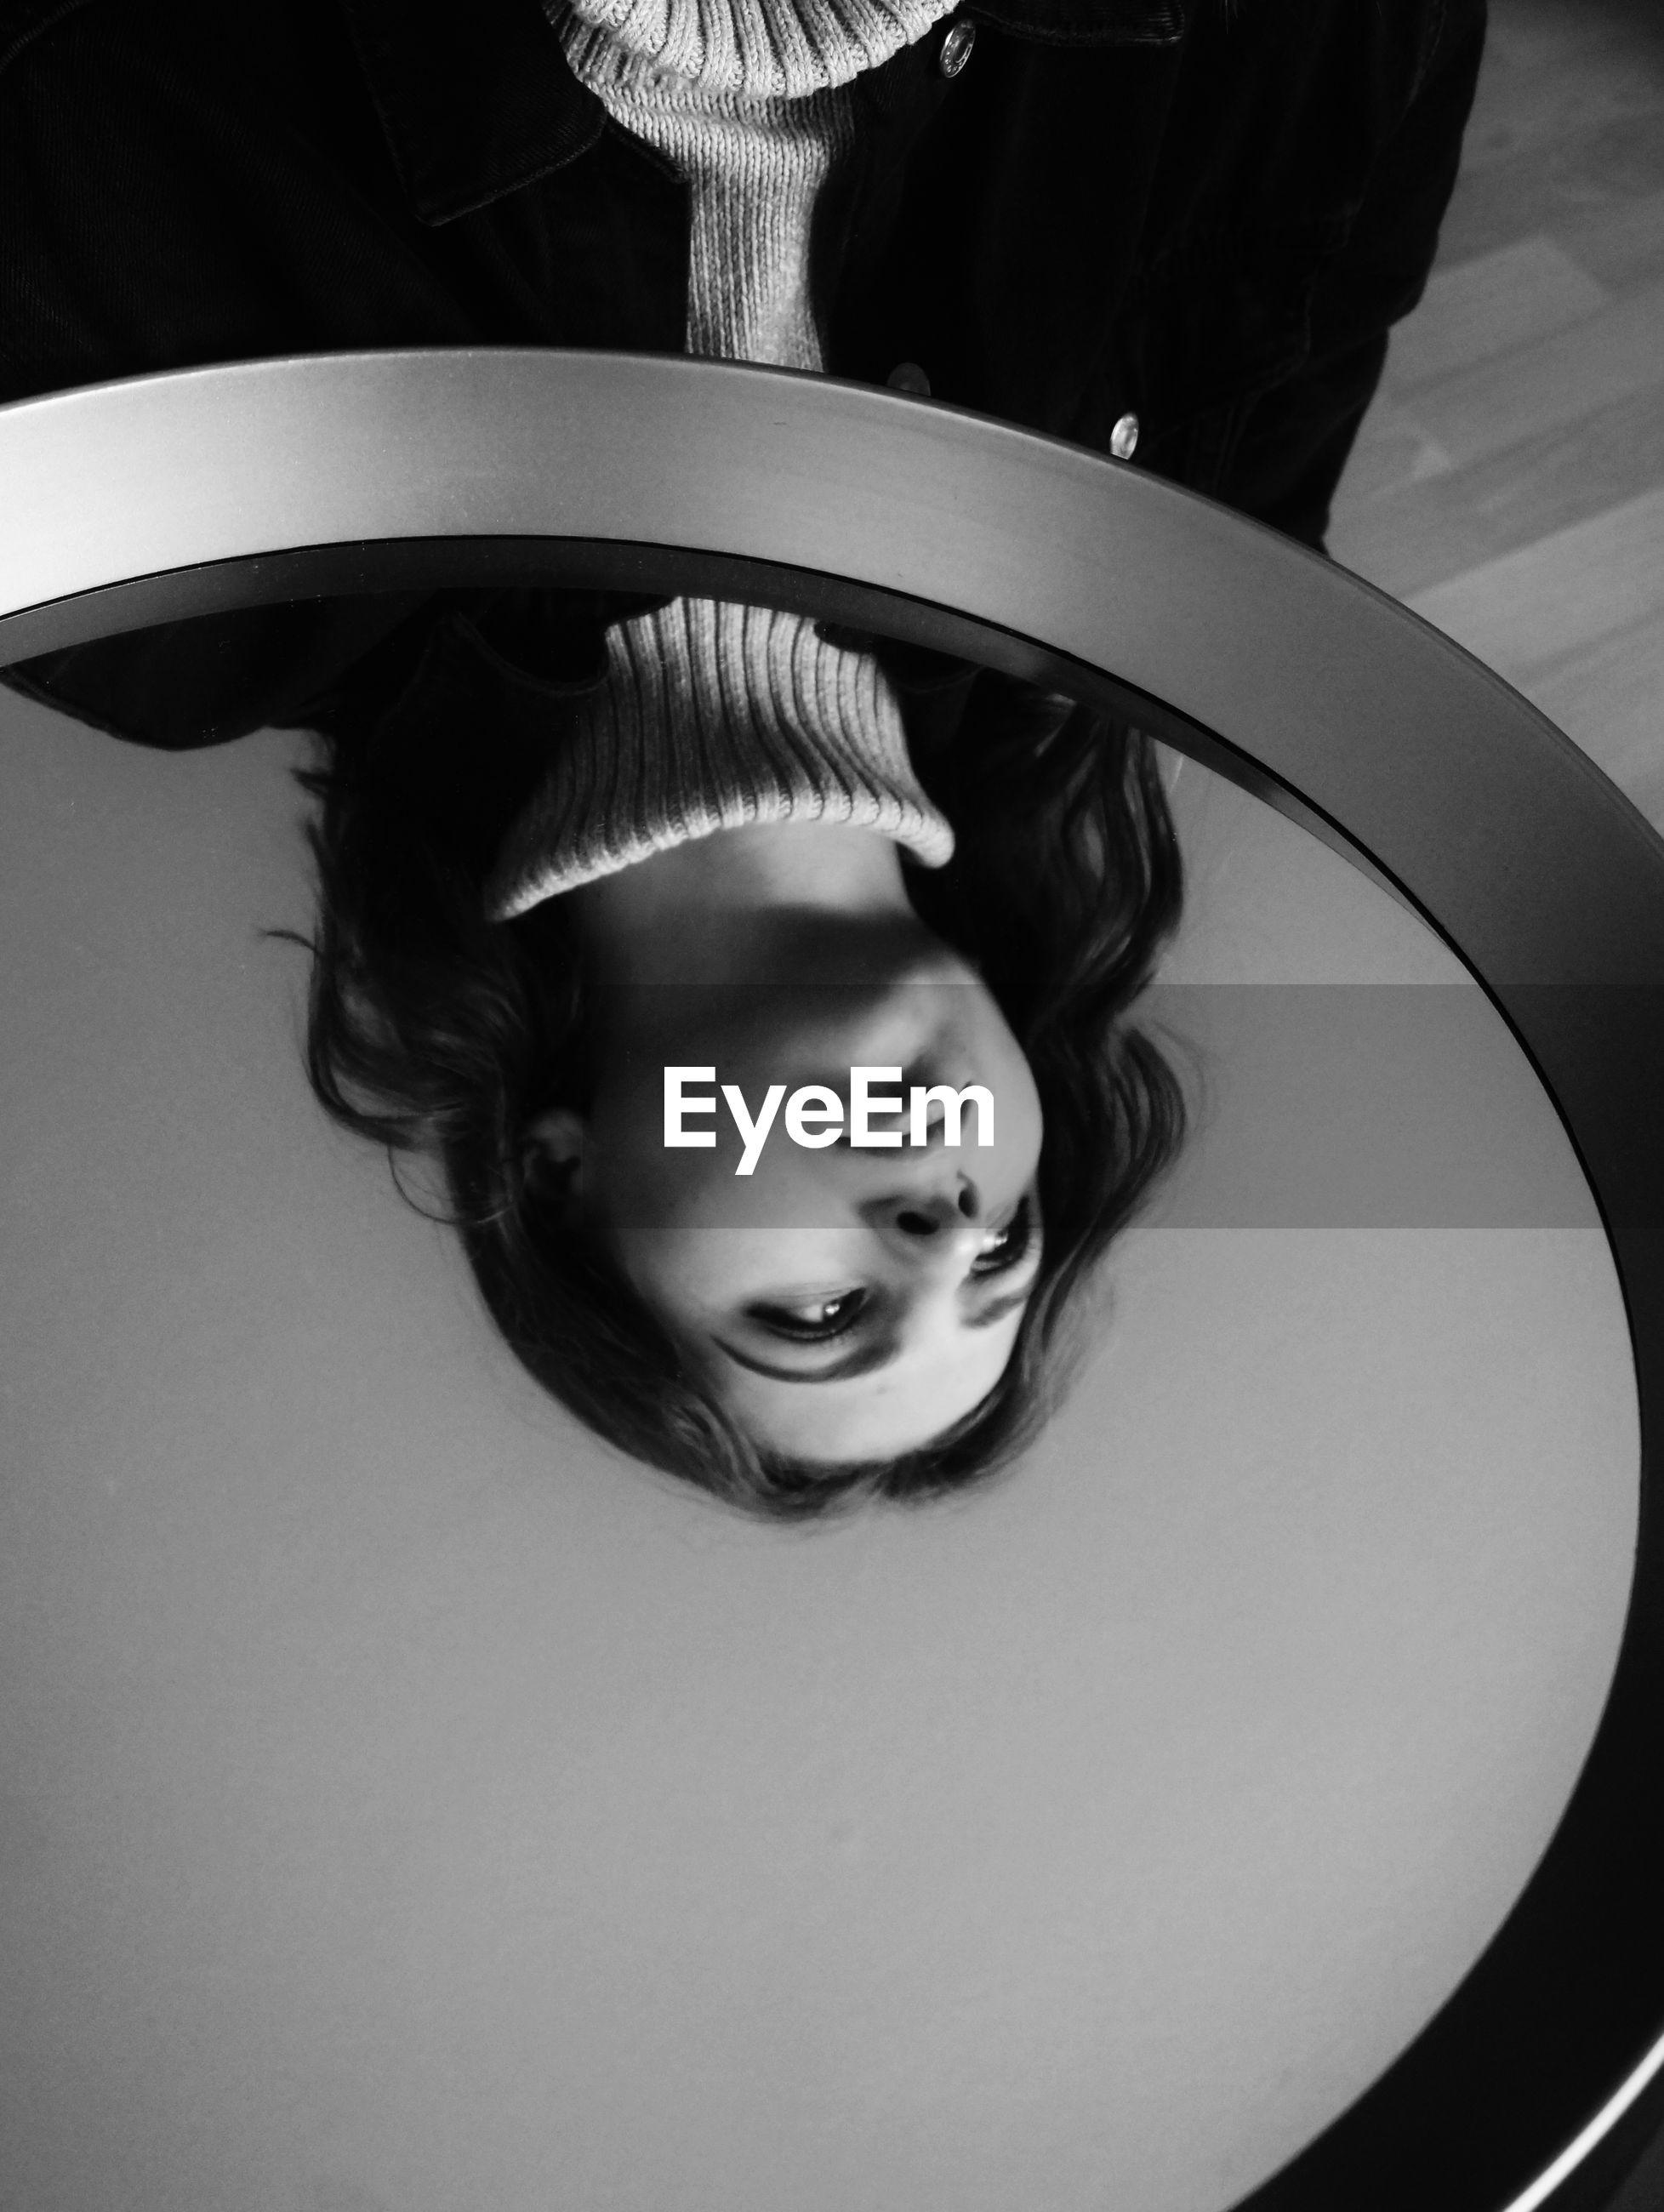 High angle view of woman reflection on glass table